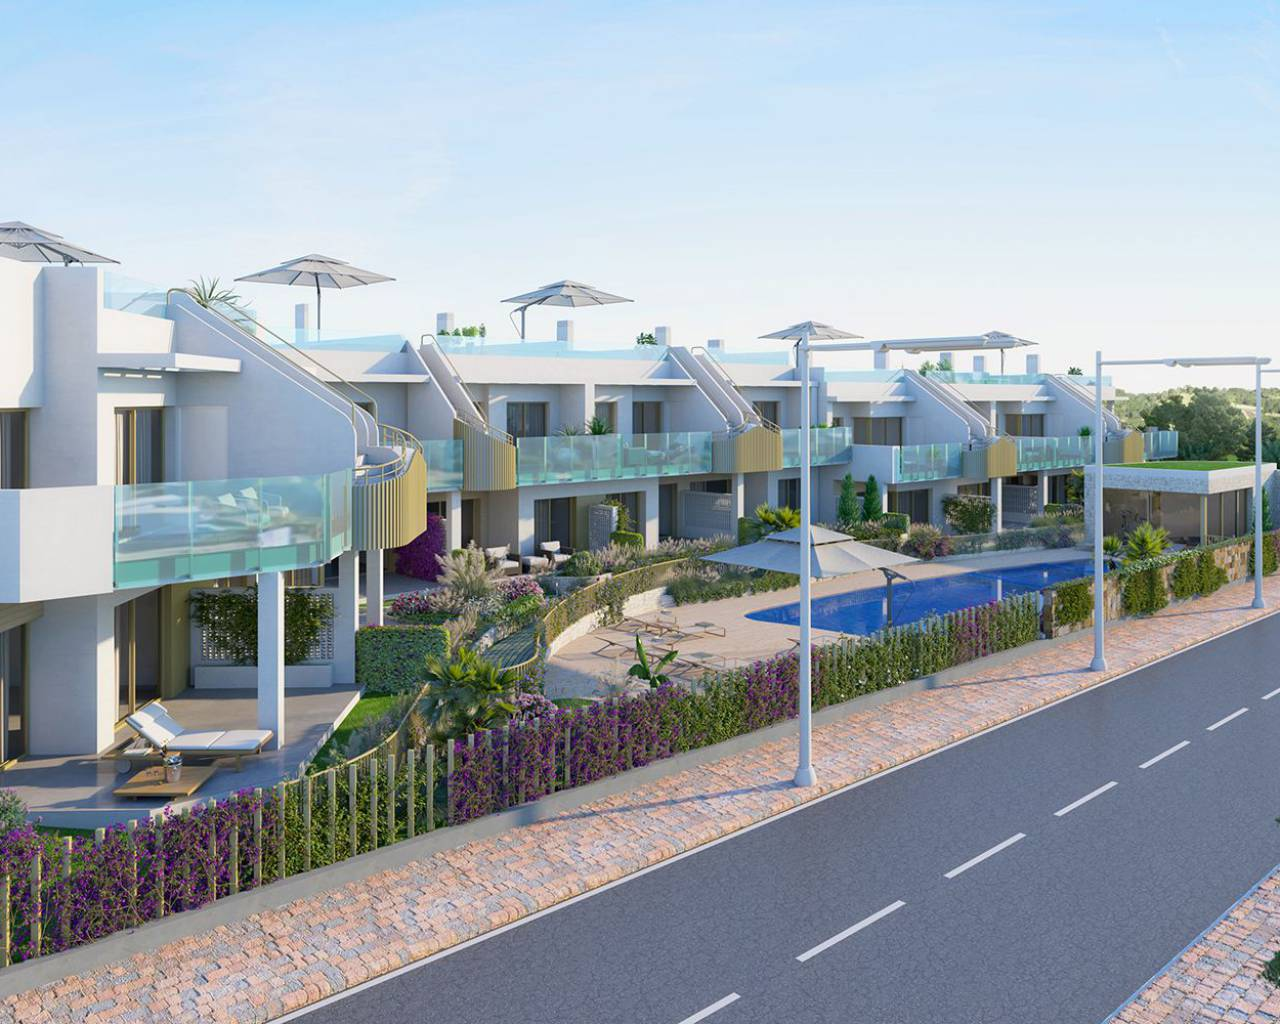 nieuwbouw-appartement-pilar-de-la-horadada_5784_xl